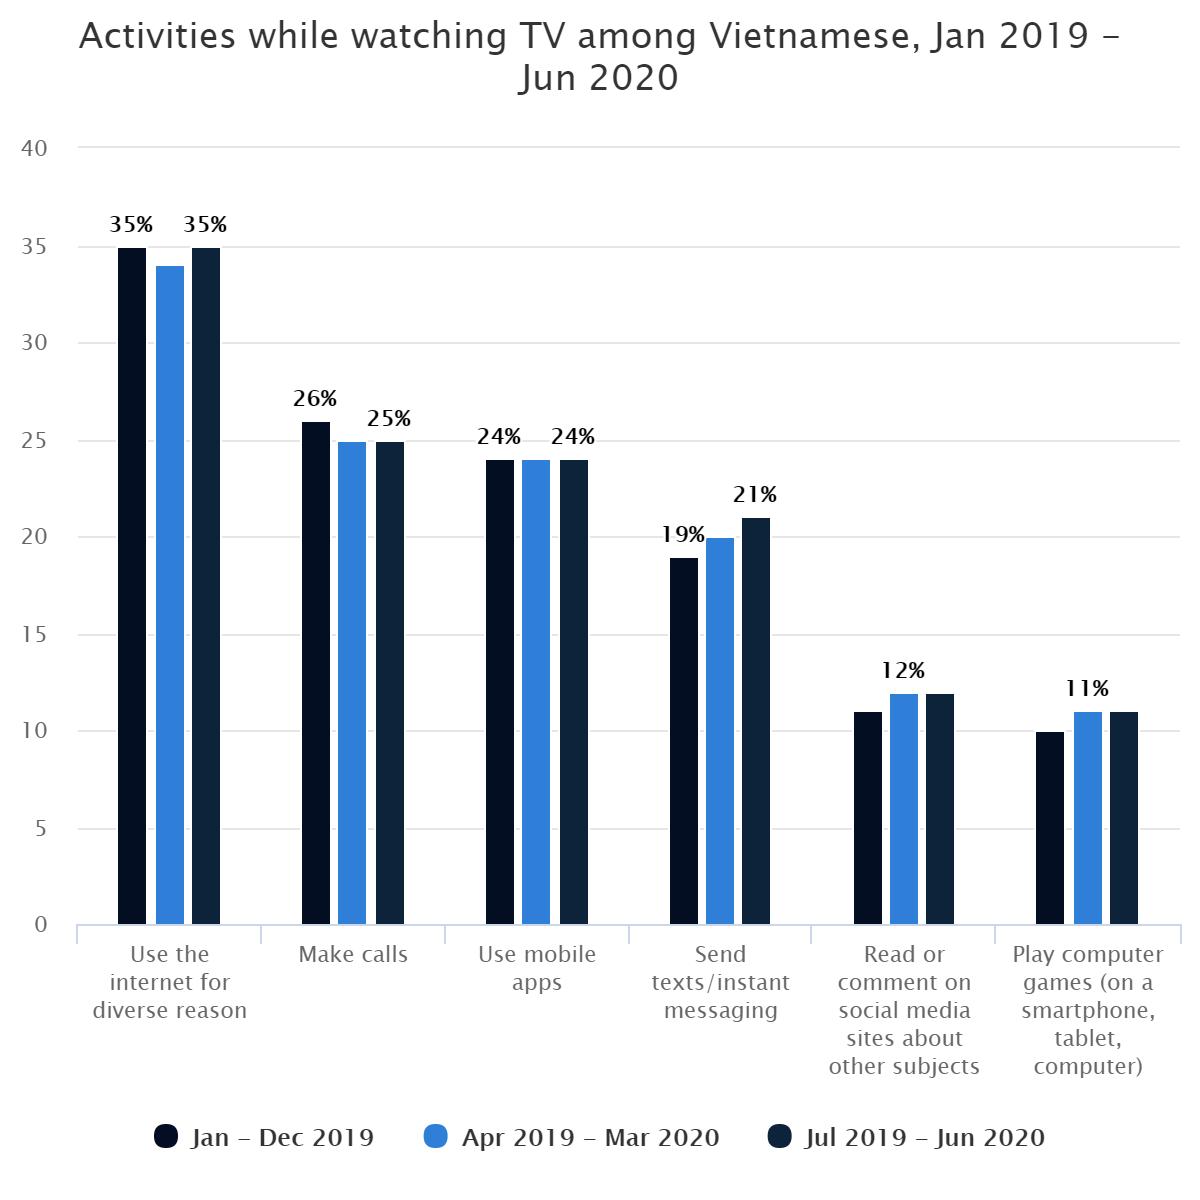 Activities while watching TV among Vietnamese, Jan 2019 – Jun 2020